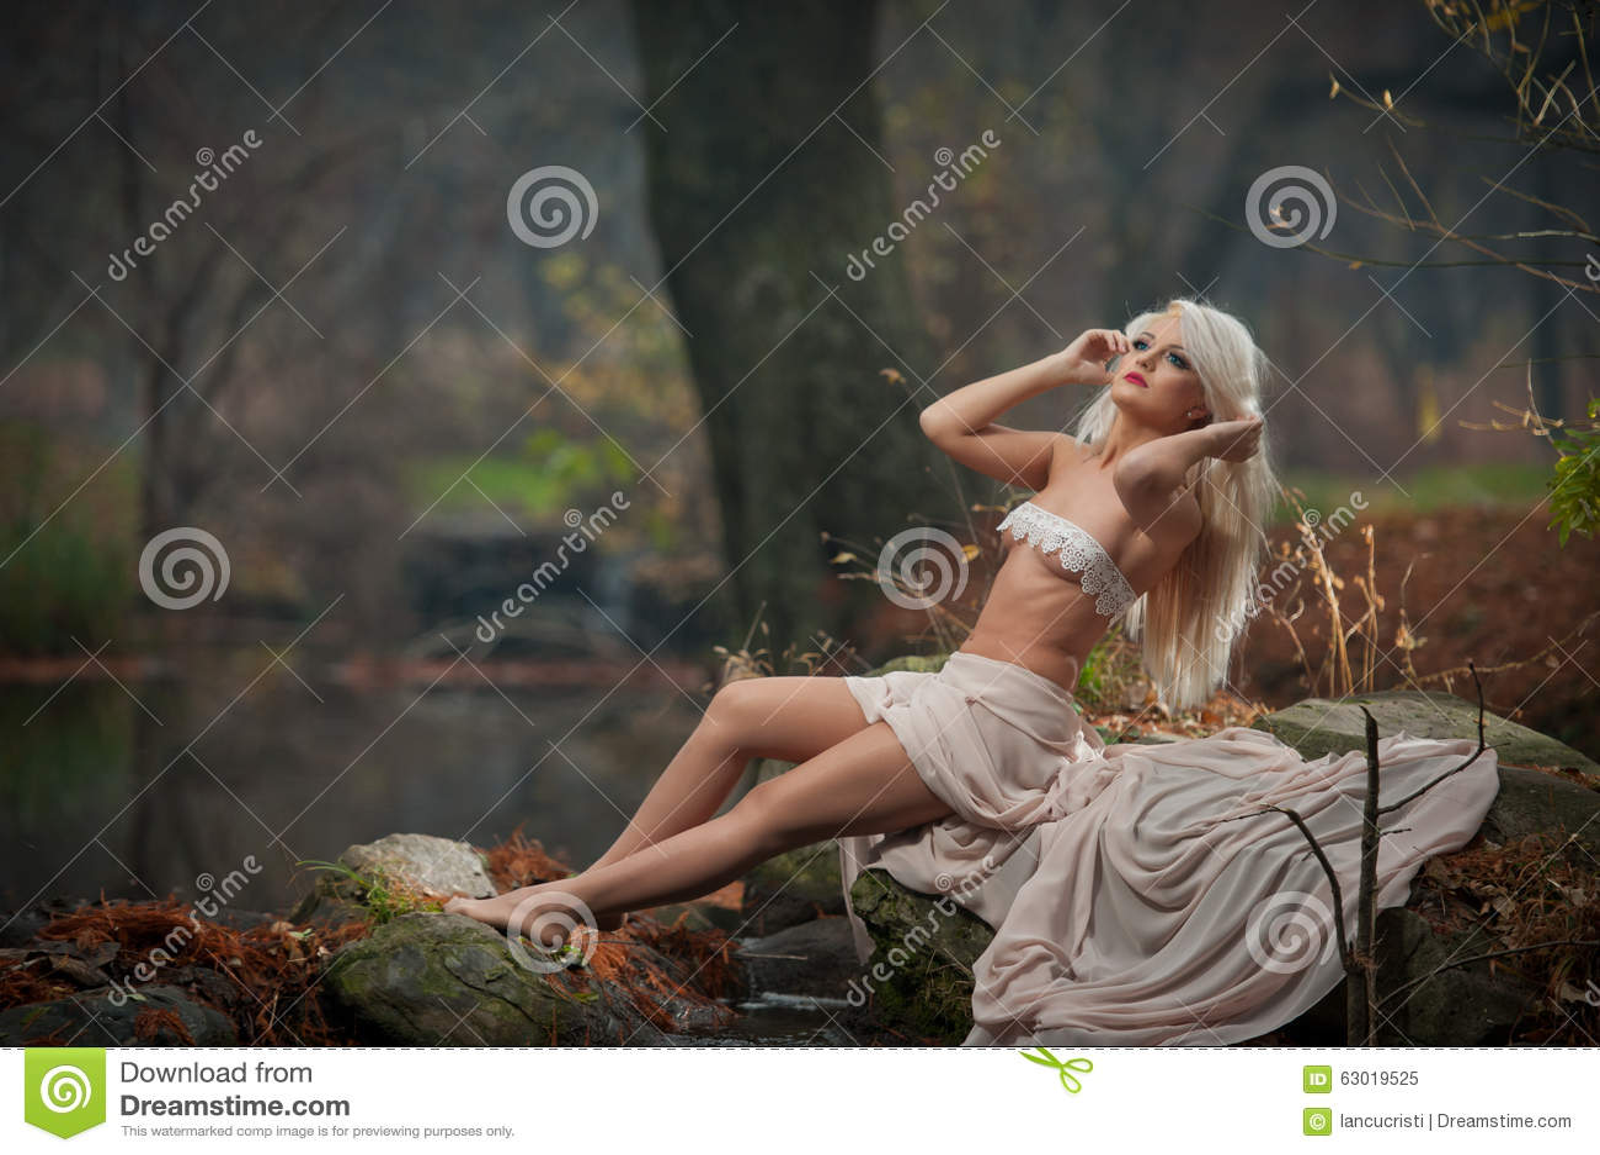 Very sensual lady in woods